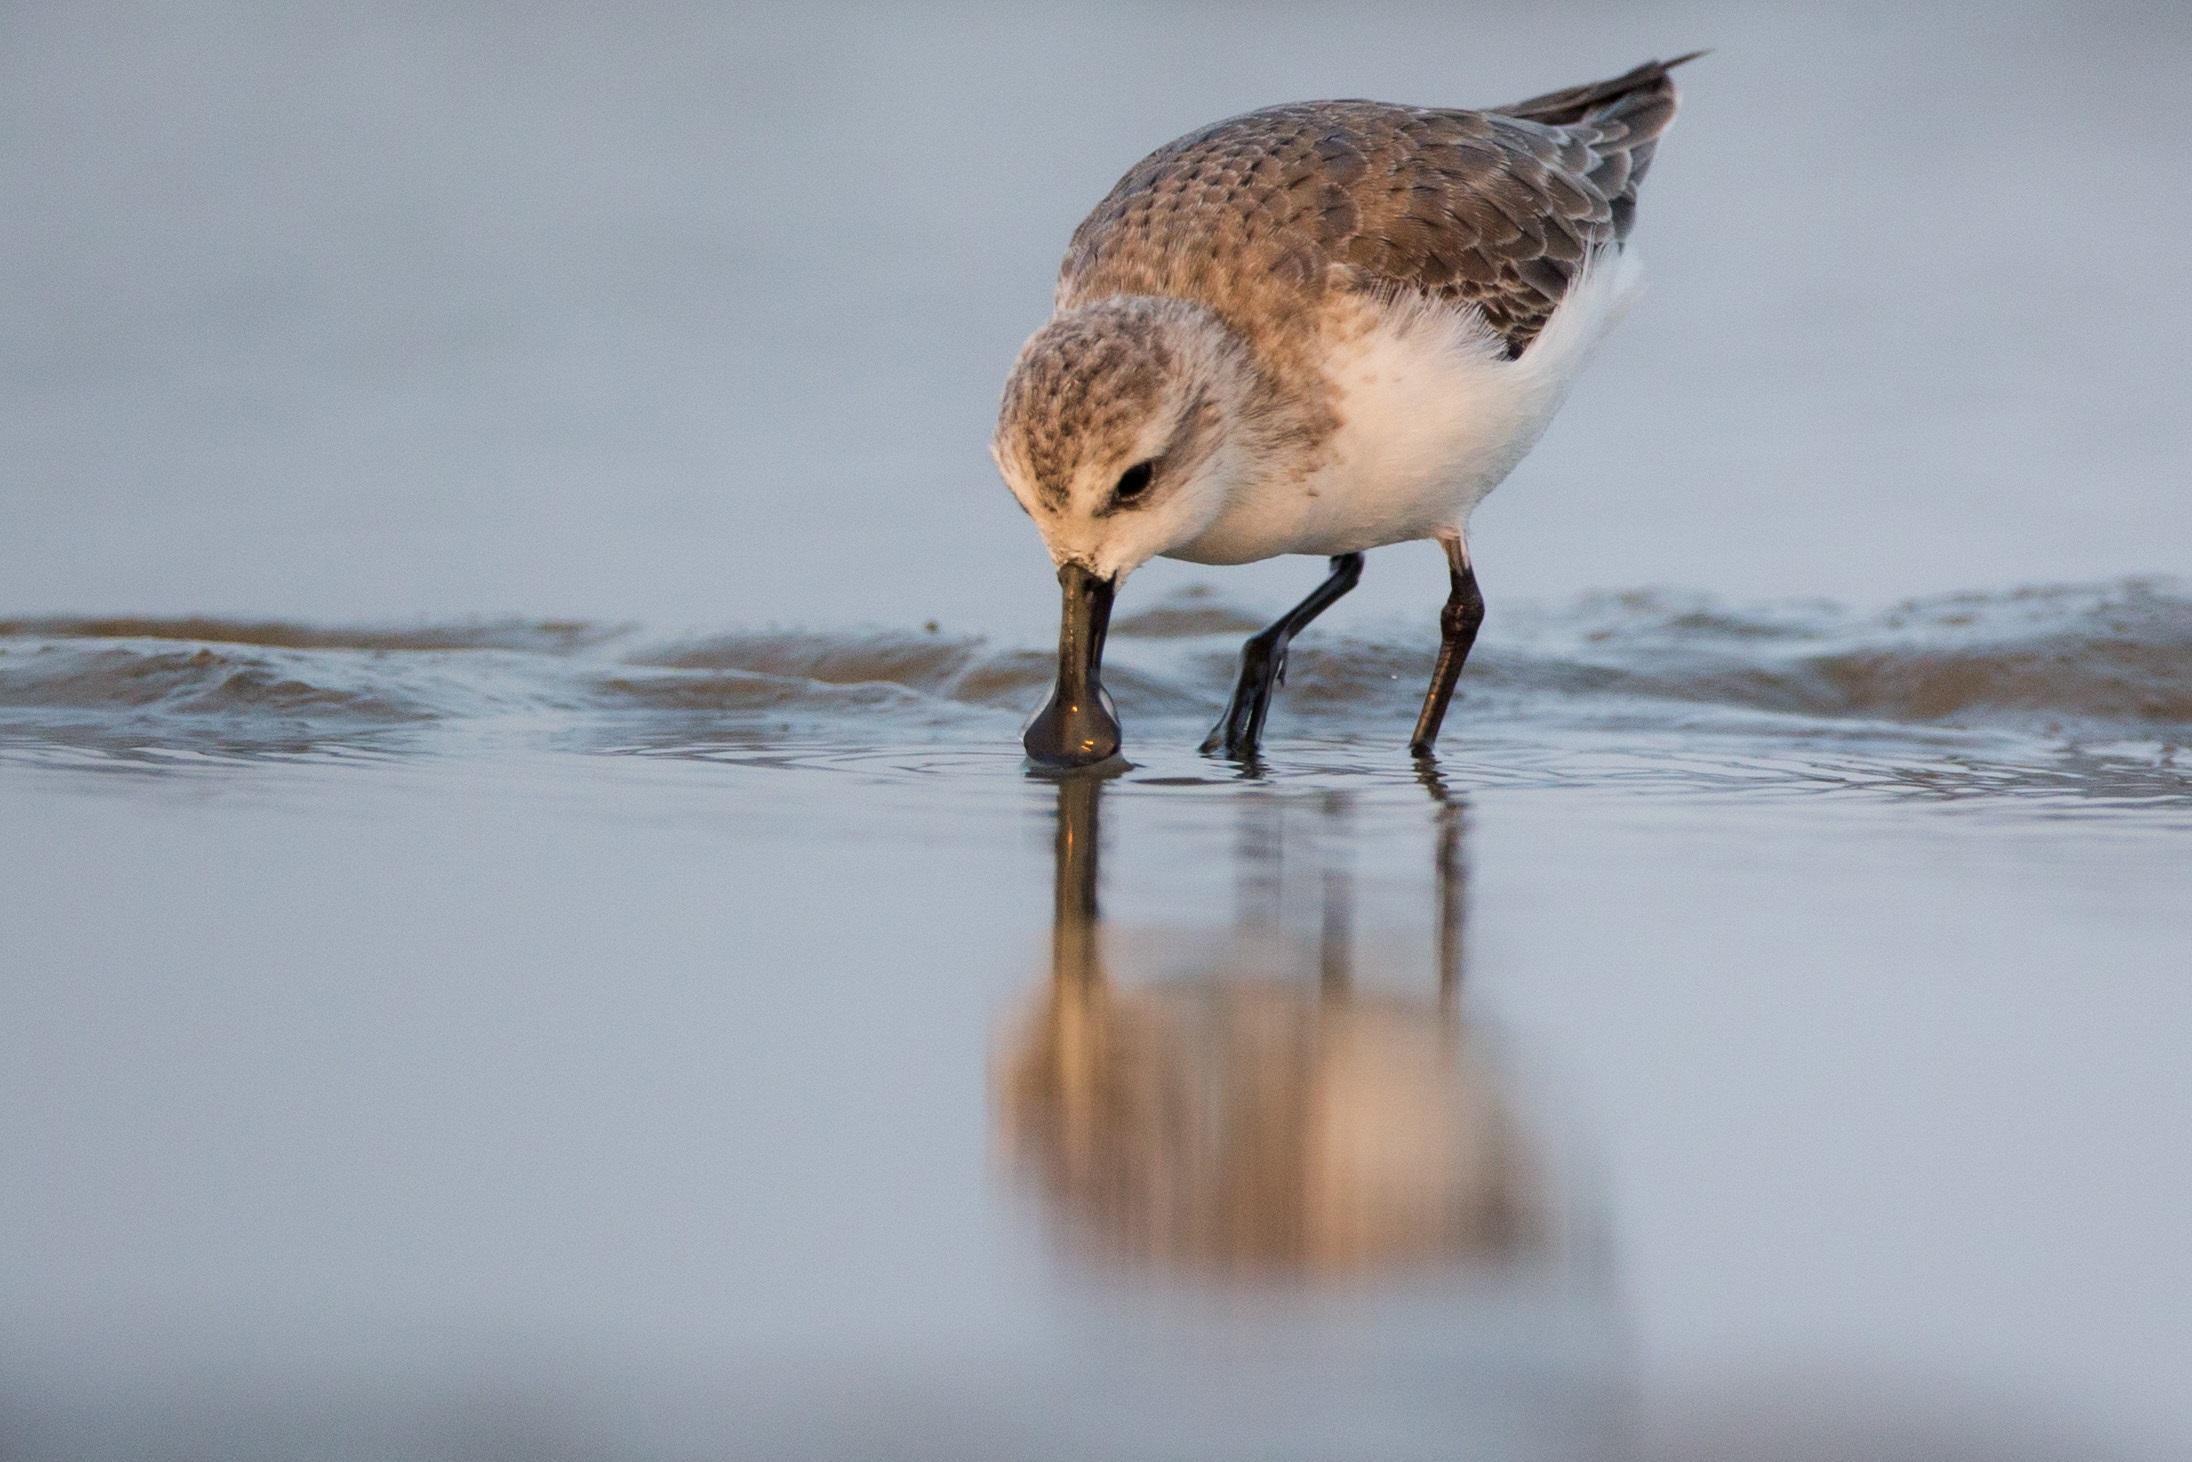 New study quantifies impact of hunting on migratory shorebird populations